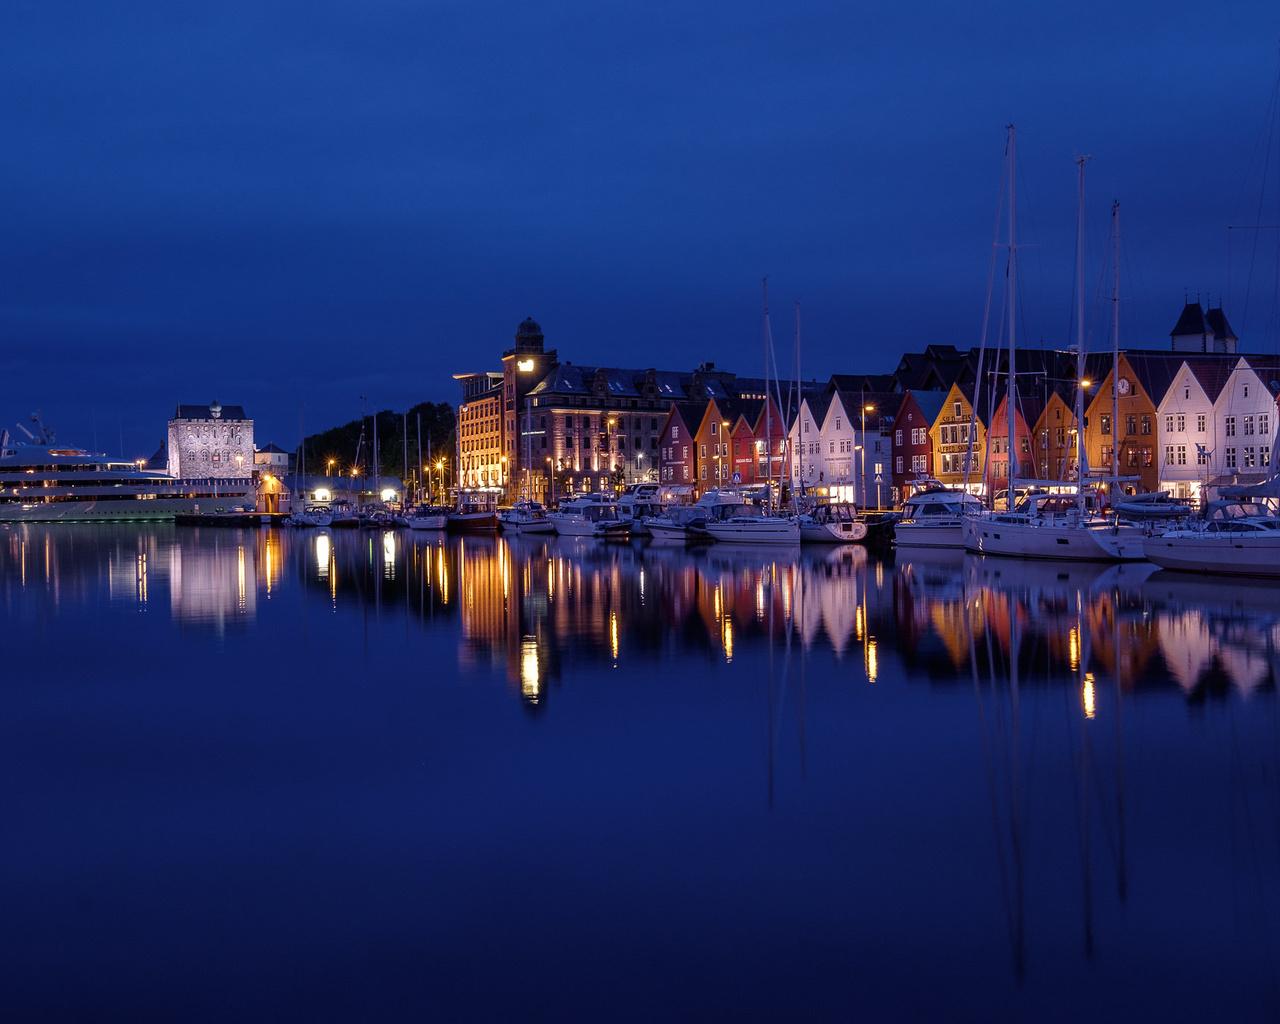 берген, норвегия, город, сумерки, панорама